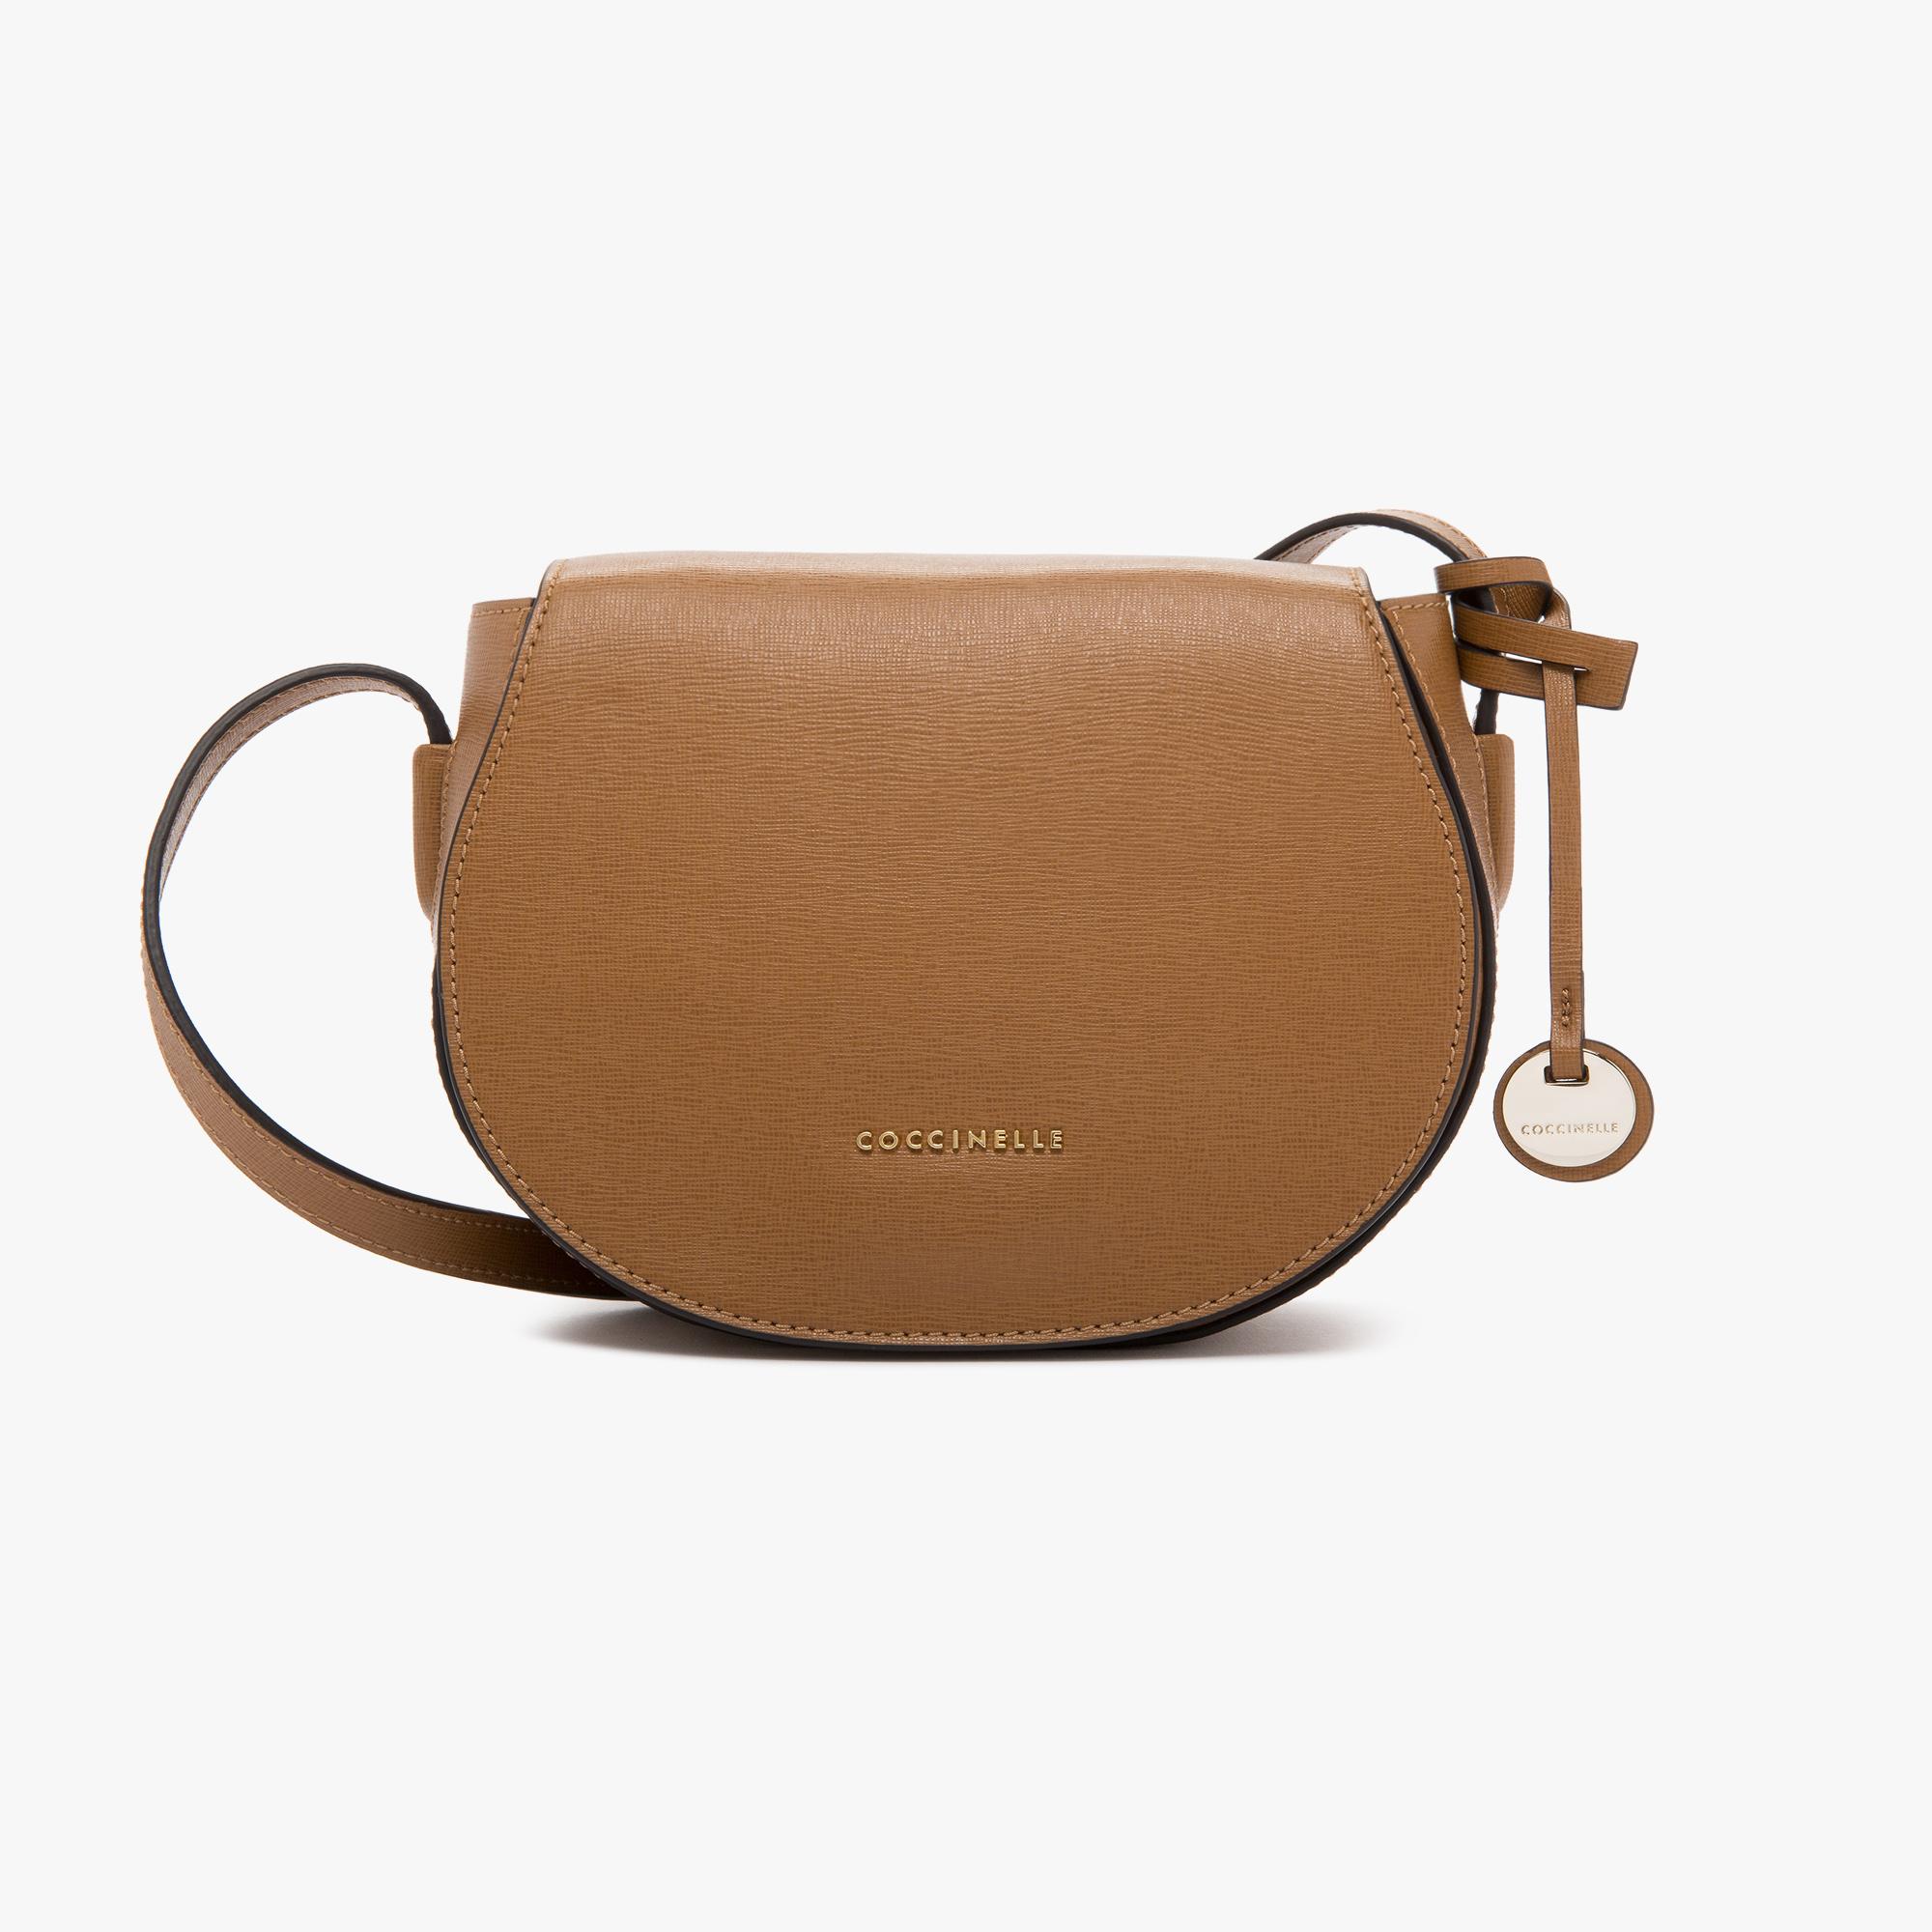 Clementine saffiano leather bandolier bag